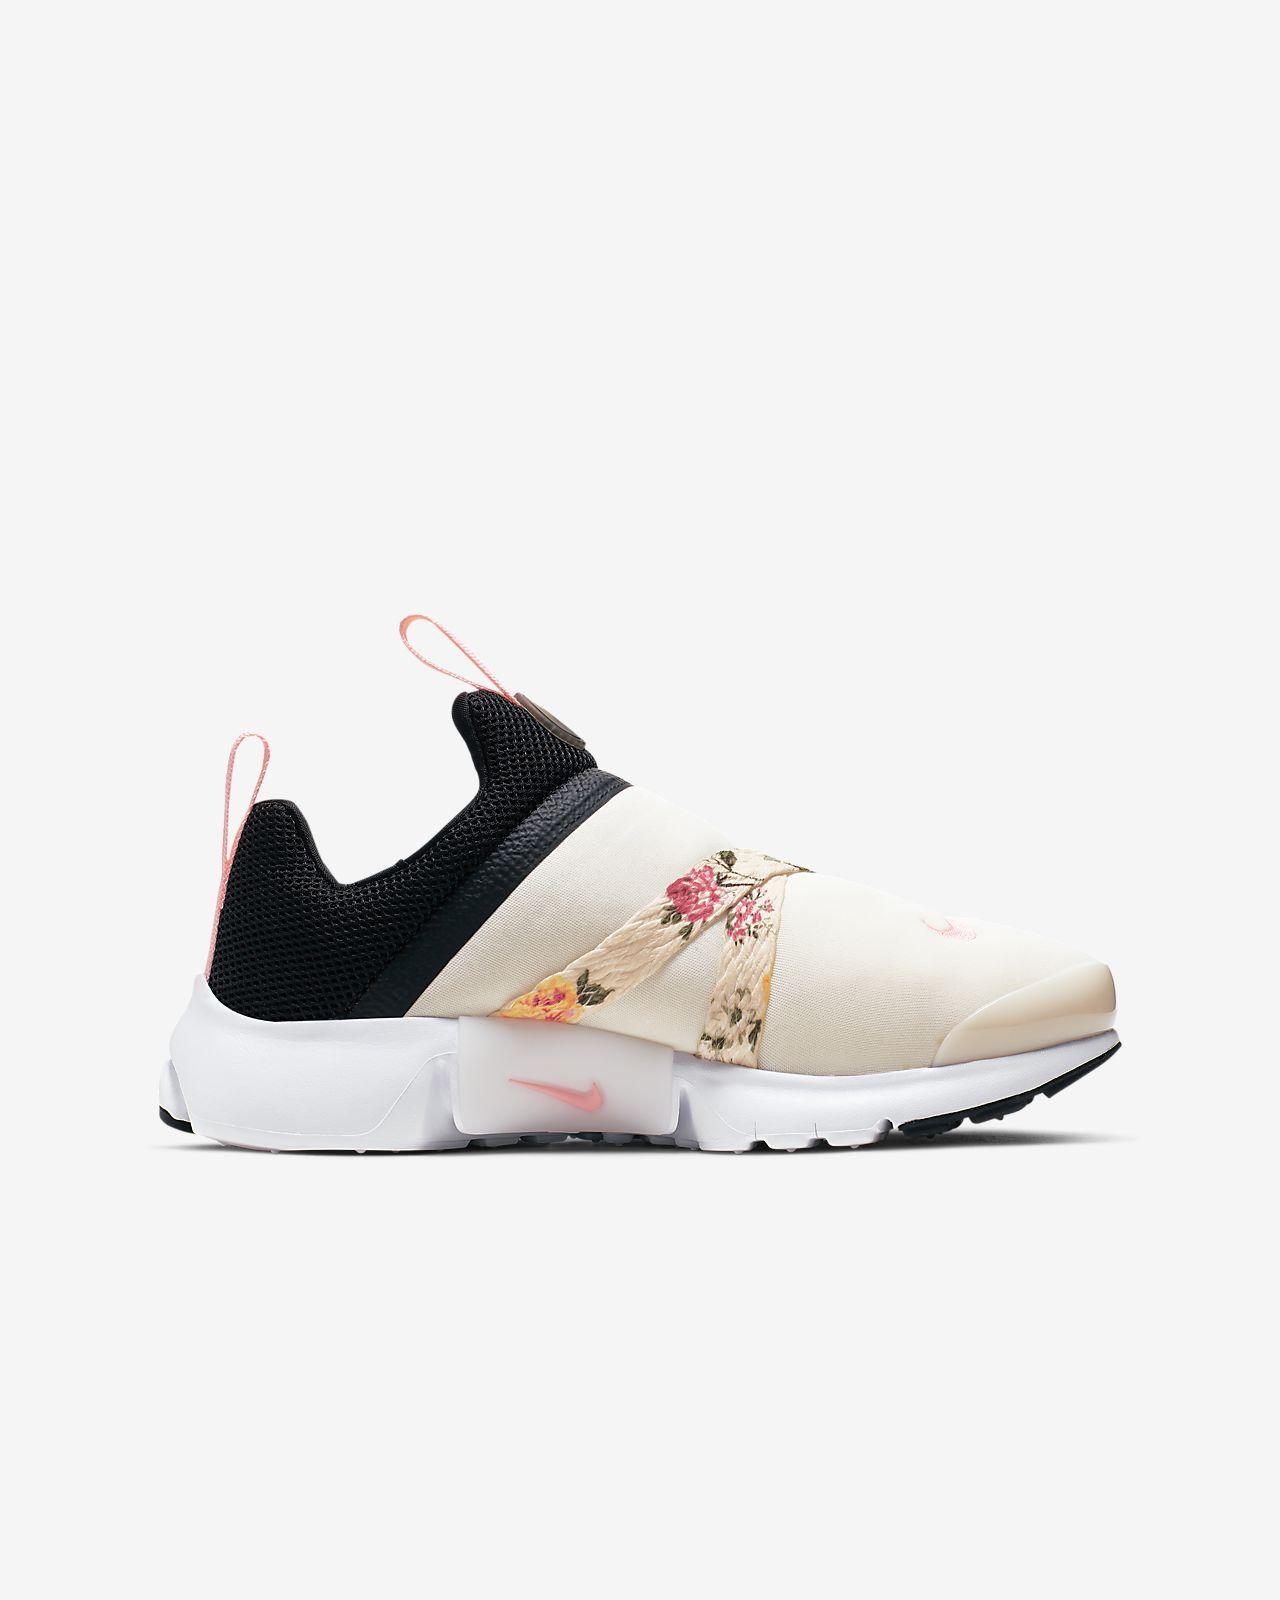 quality design 498da 46cb7 Nike Presto Extreme Vintage Floral Big Kids' Shoe